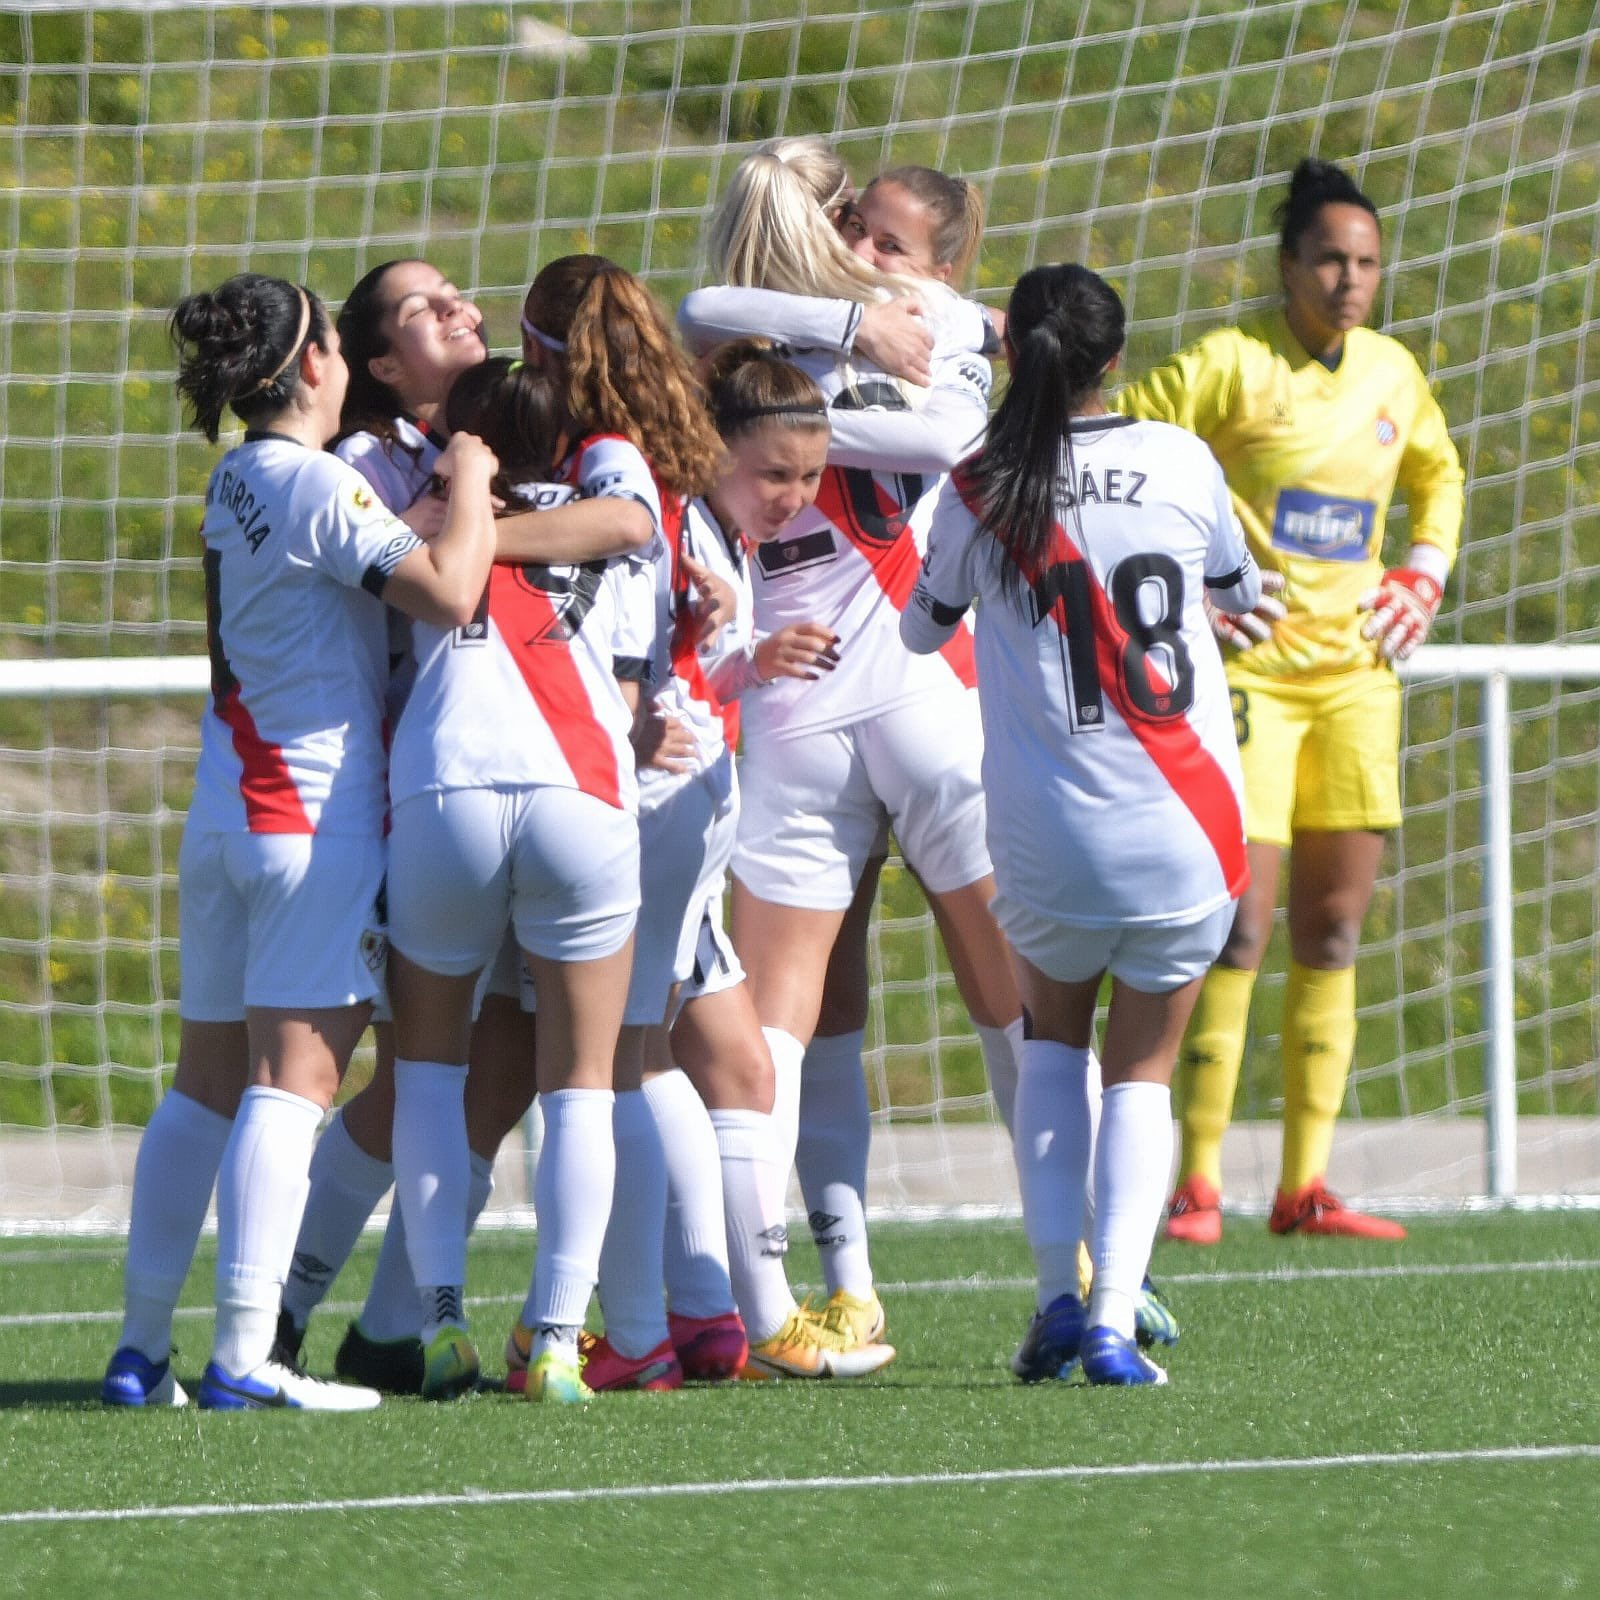 Rayo Vallecano - RCDE Espanyol | Fuente: Rayo Femenino